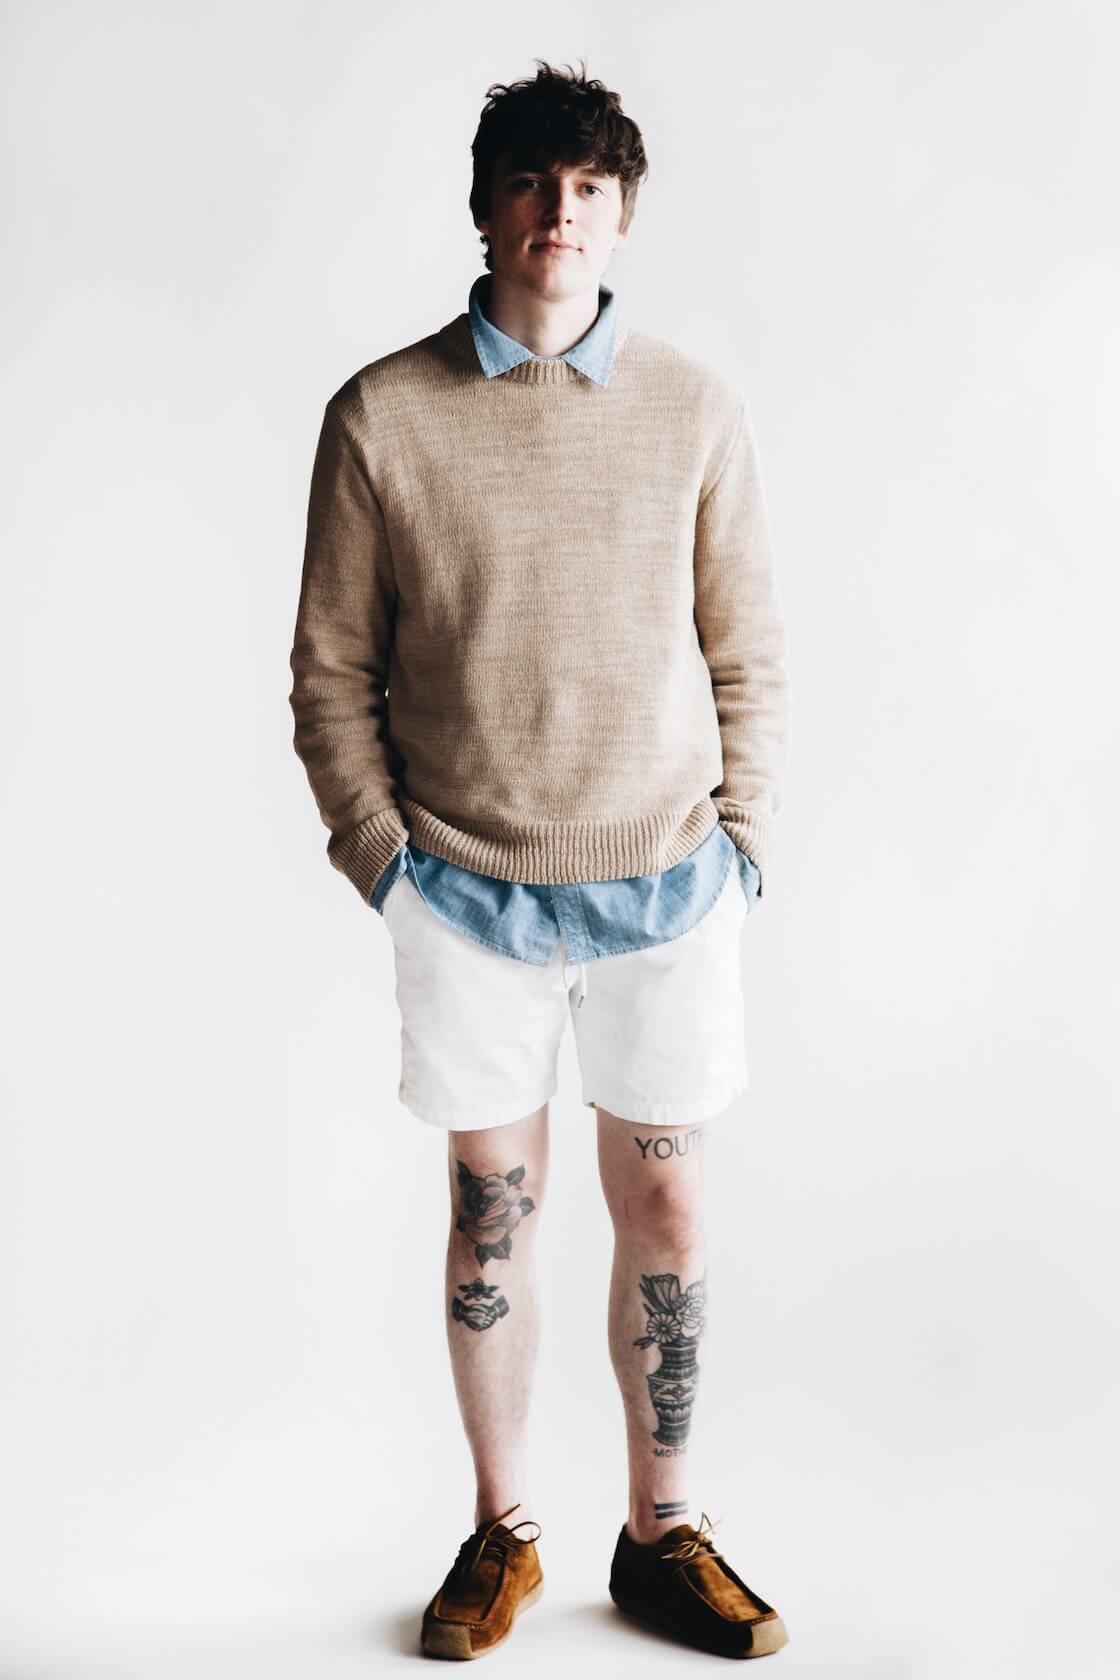 canoe club x corridor nyc blue chambray shirt, universal works beach shorts and yuks type 4 mocs on body